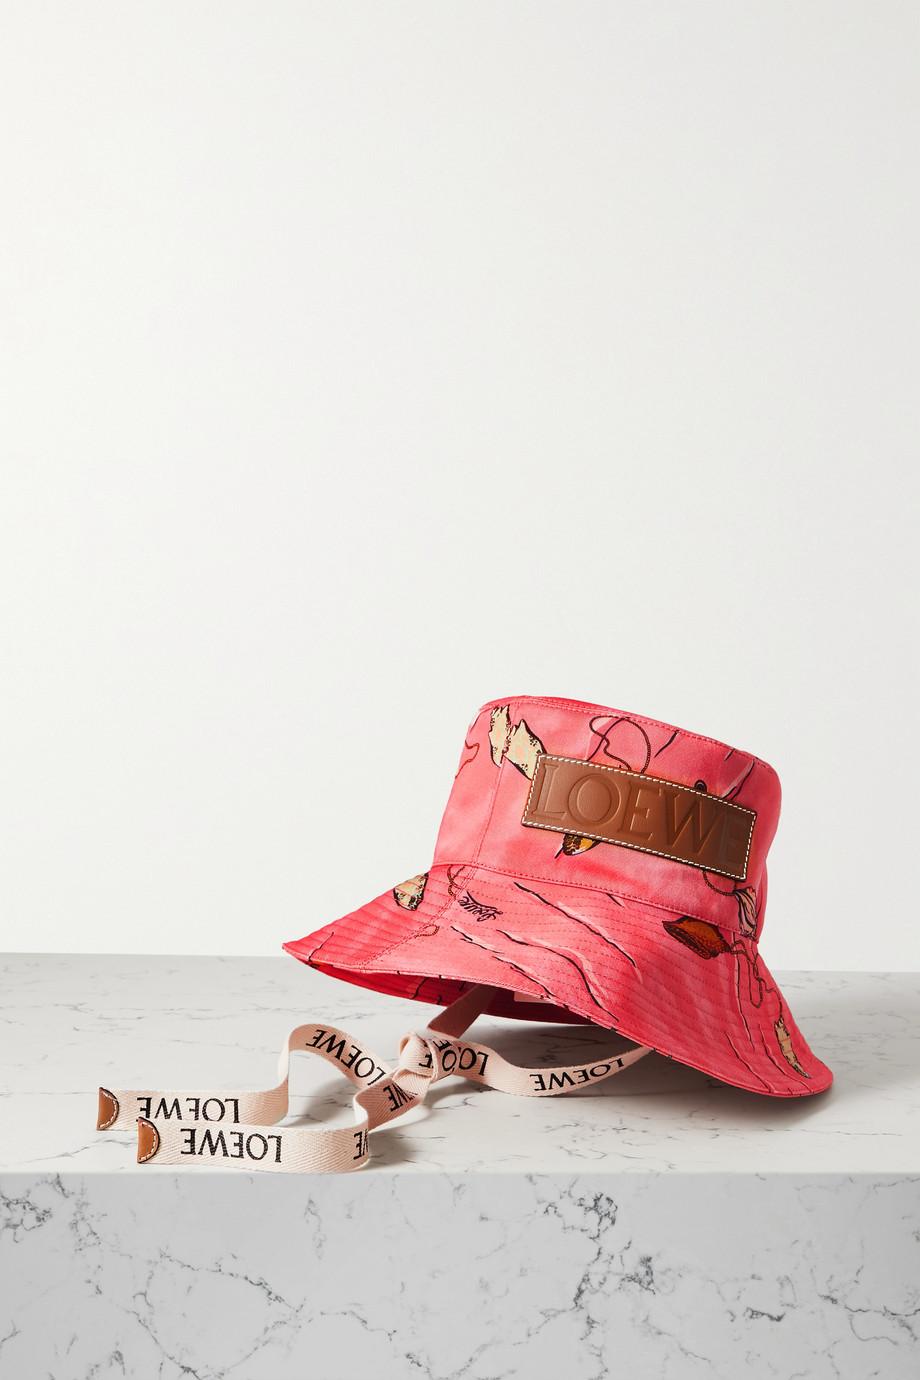 Loewe + Paula's Ibiza leather-trimmed printed cotton-twill bucket hat